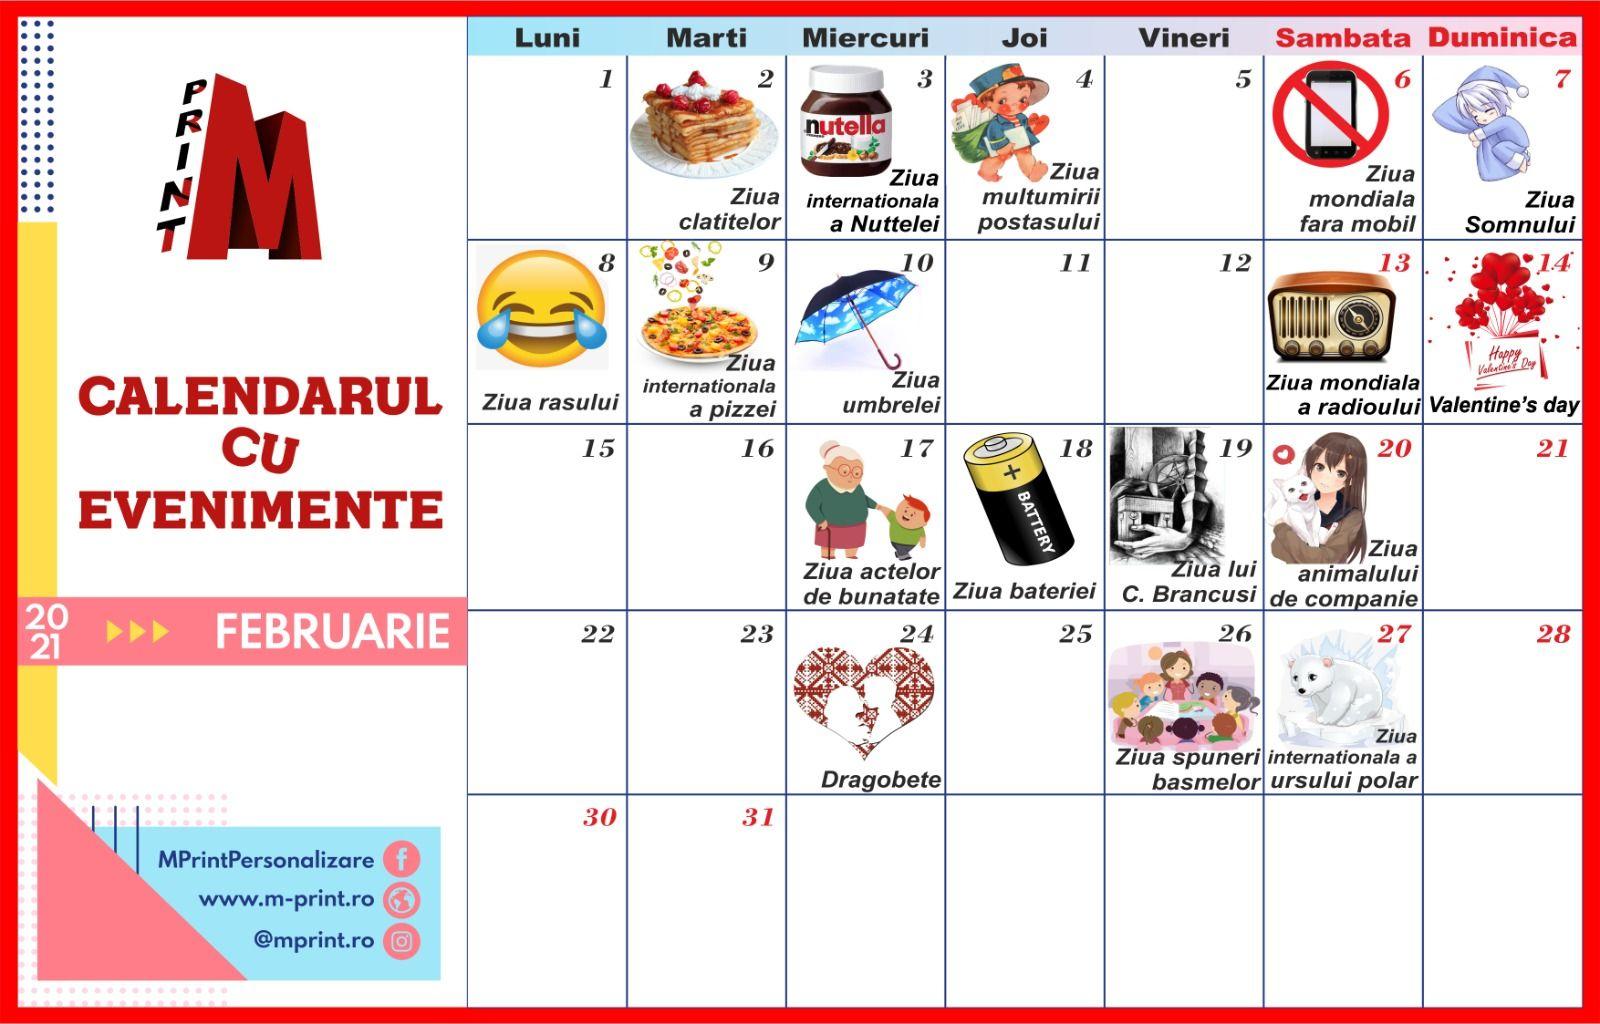 Calendarul cu evenimente al lunii Februarie 2021